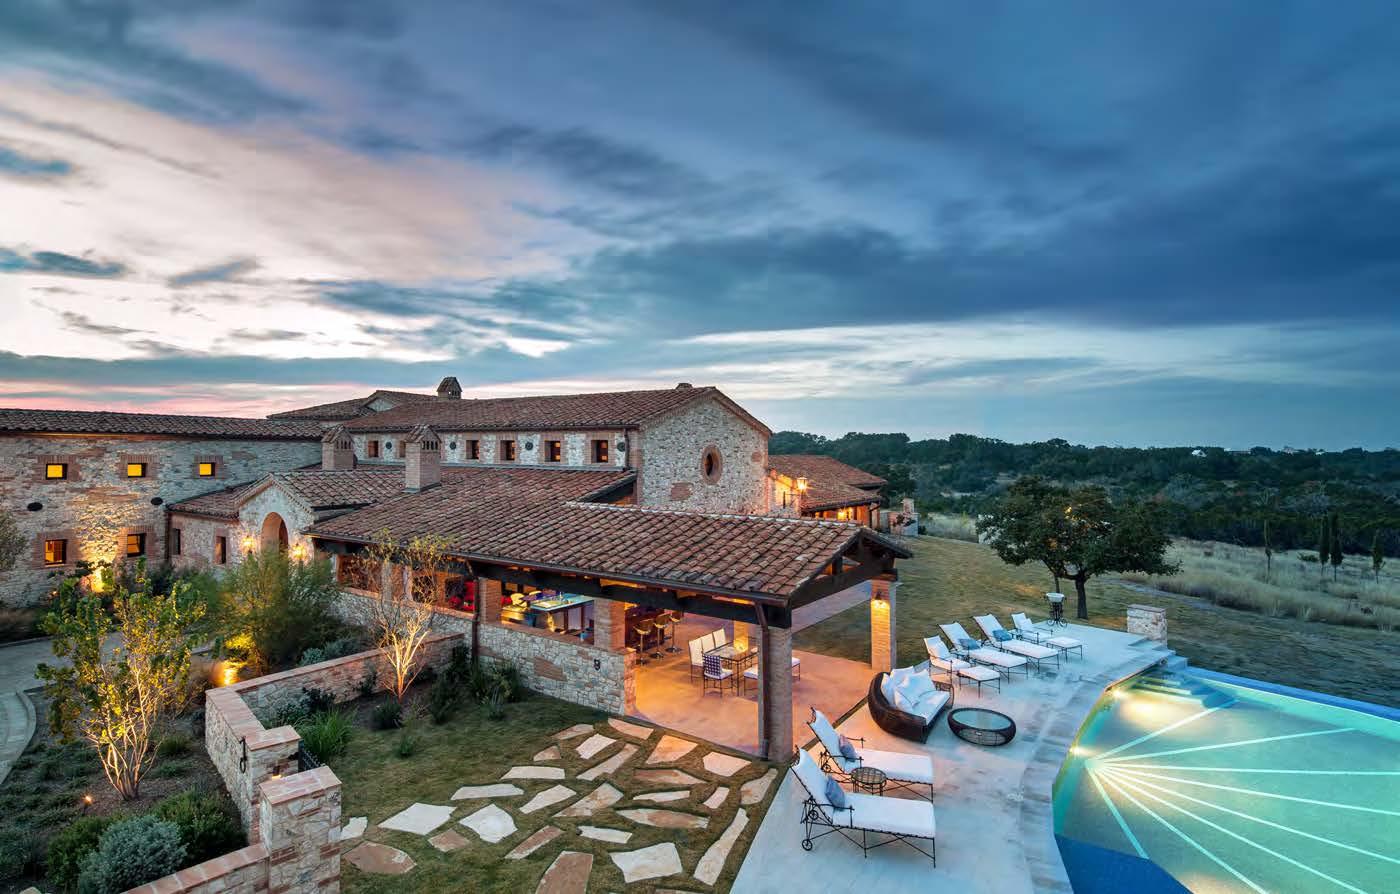 Modern Day Tuscan Farmhouse